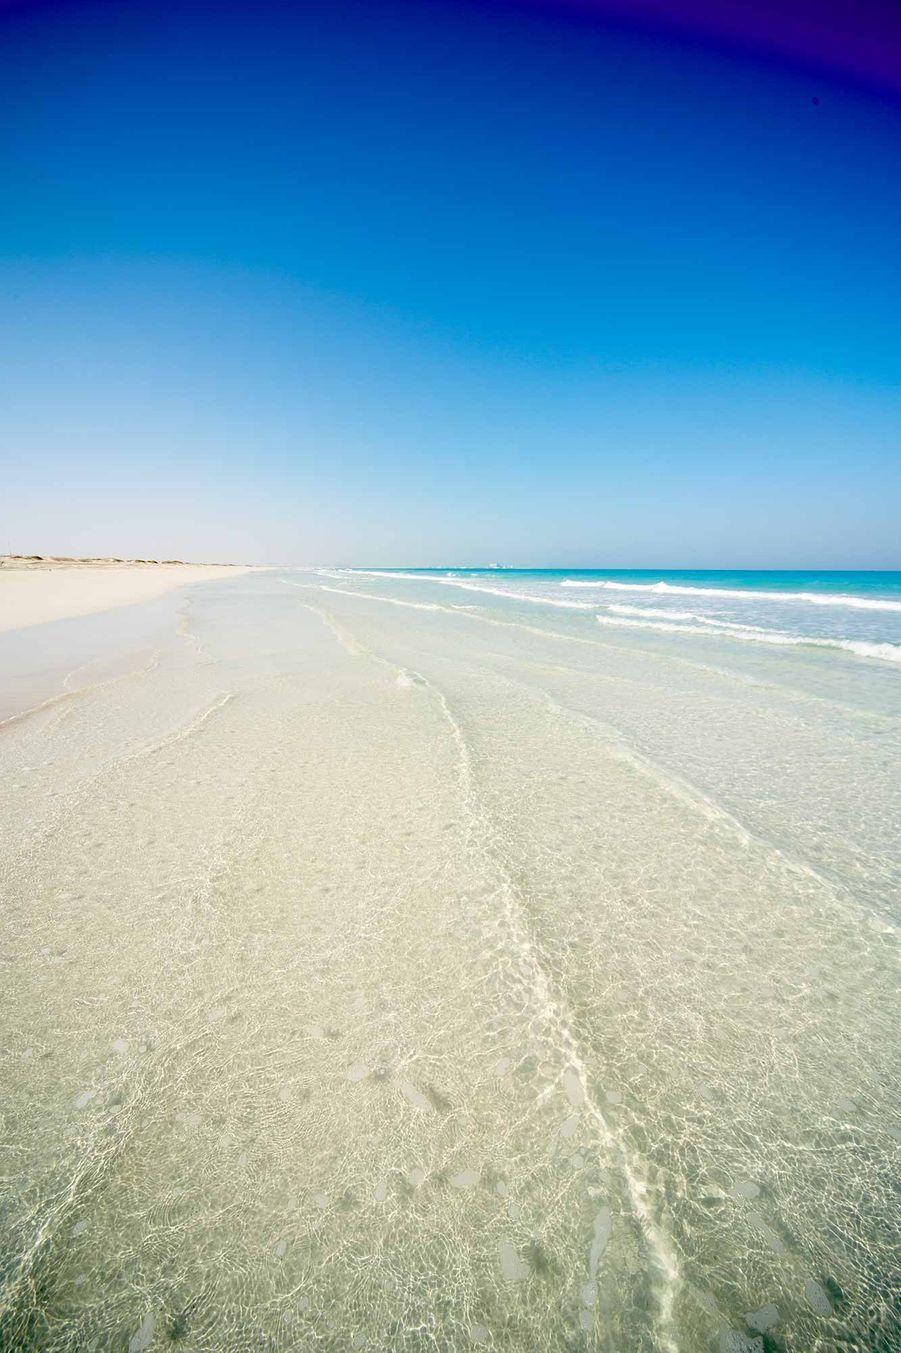 La plage deMirfa